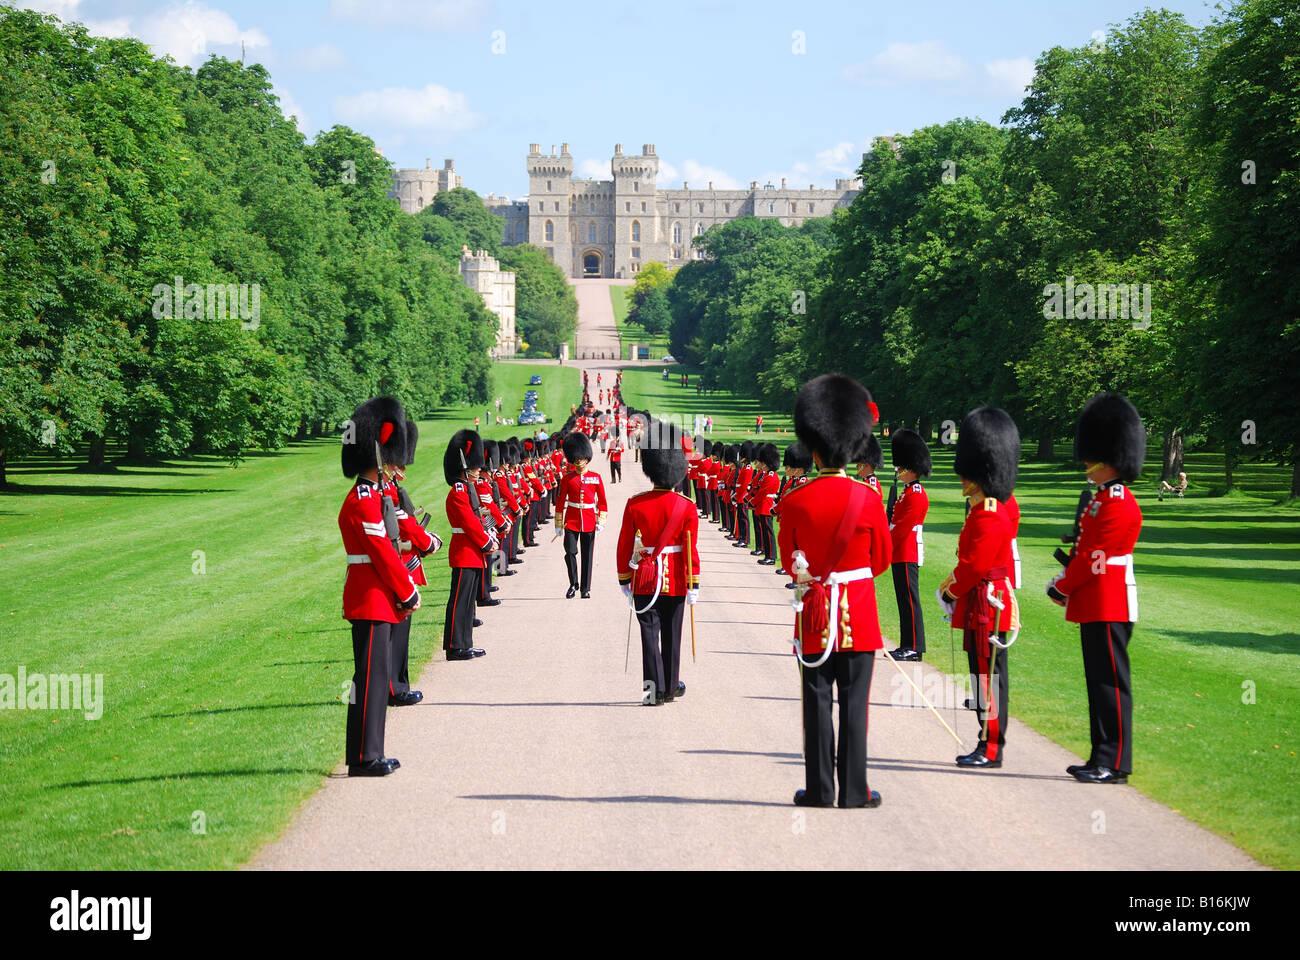 Household Cavalry parading on The Long Walk, Windsor Castle, Windsor, Berkshire, England, United Kingdom - Stock Image